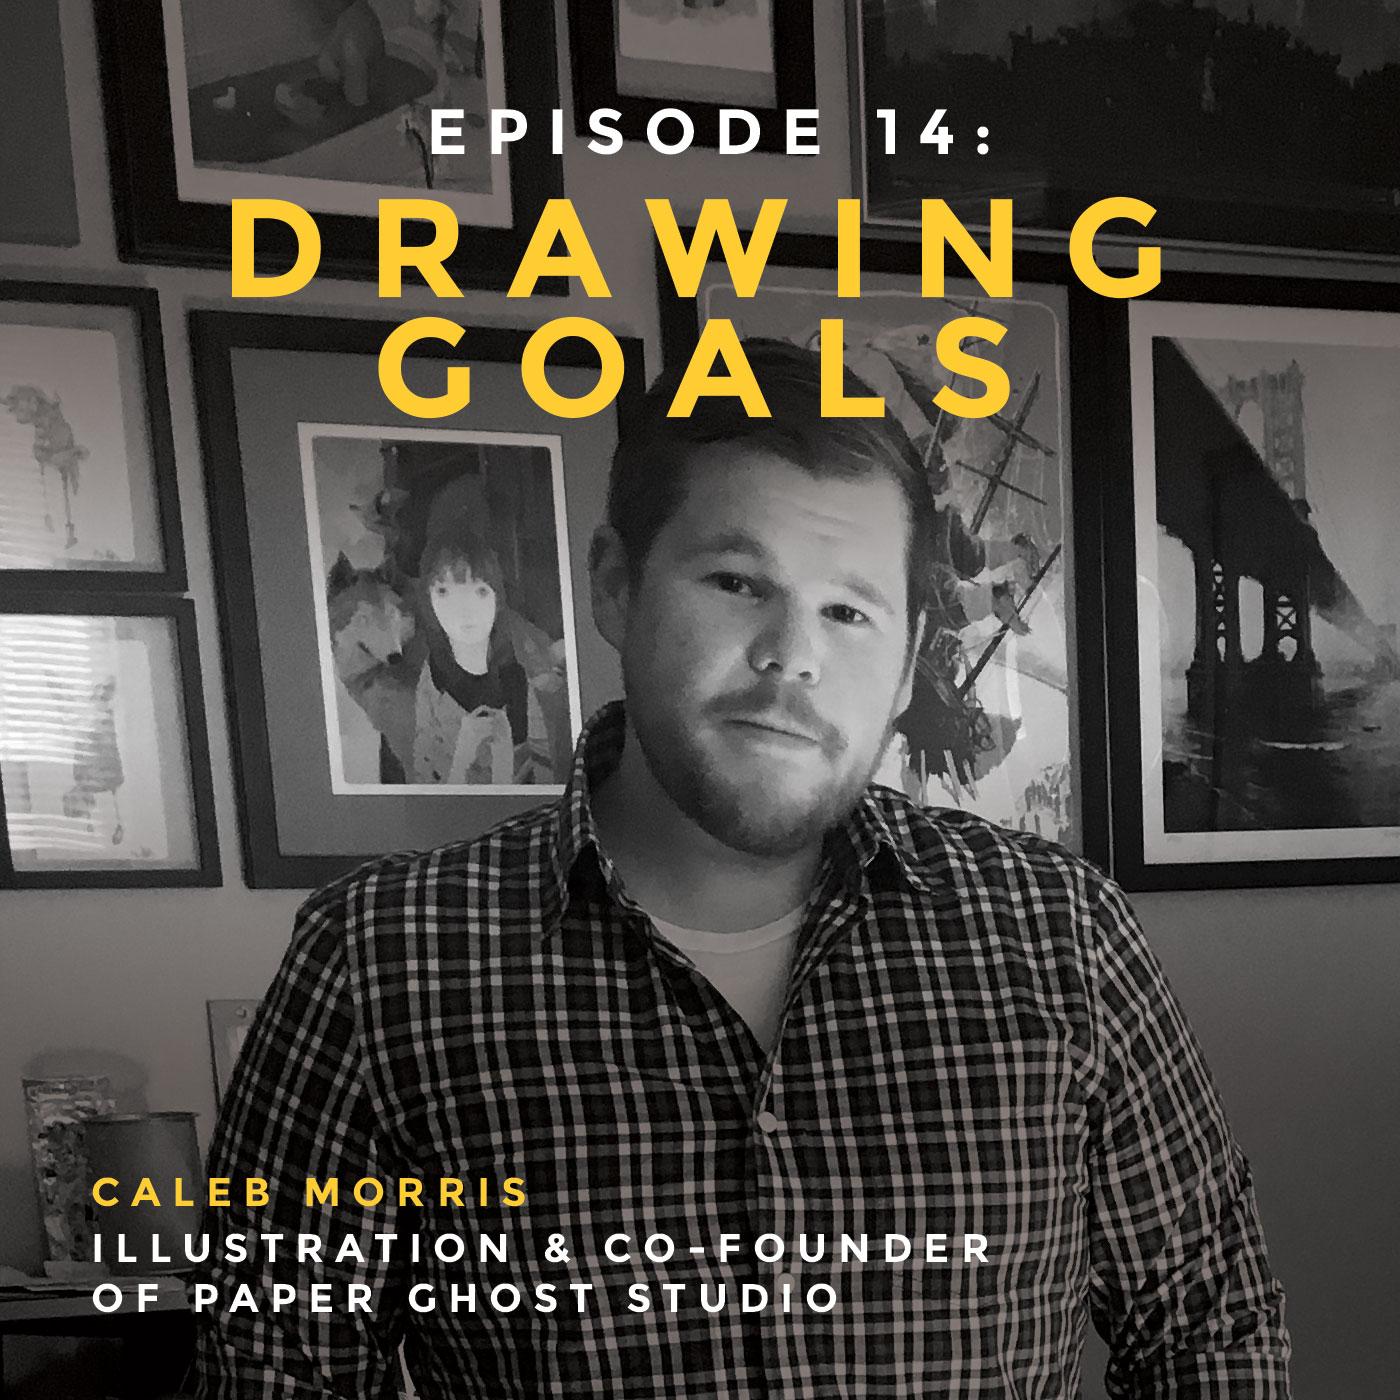 interview with Caleb Morris, illustrator and cofounder of Paper Ghost Studio in Atlanta, Georgia